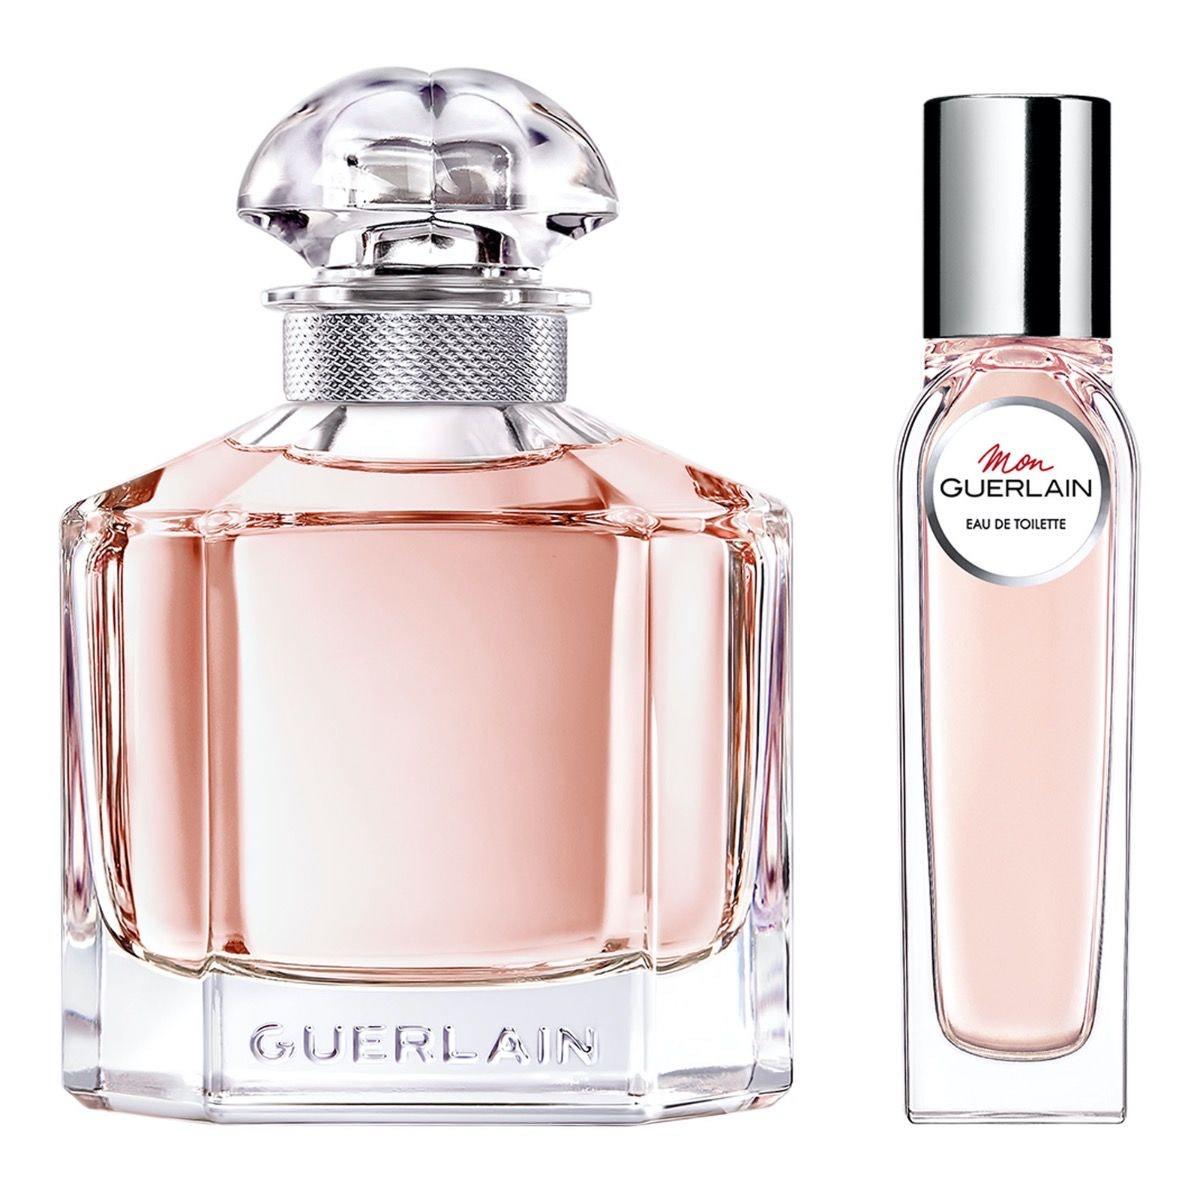 Guerlain Mon Guerlain Eau de Toilette 100ml + 20ml Spray £37.95 @ Perfume Price